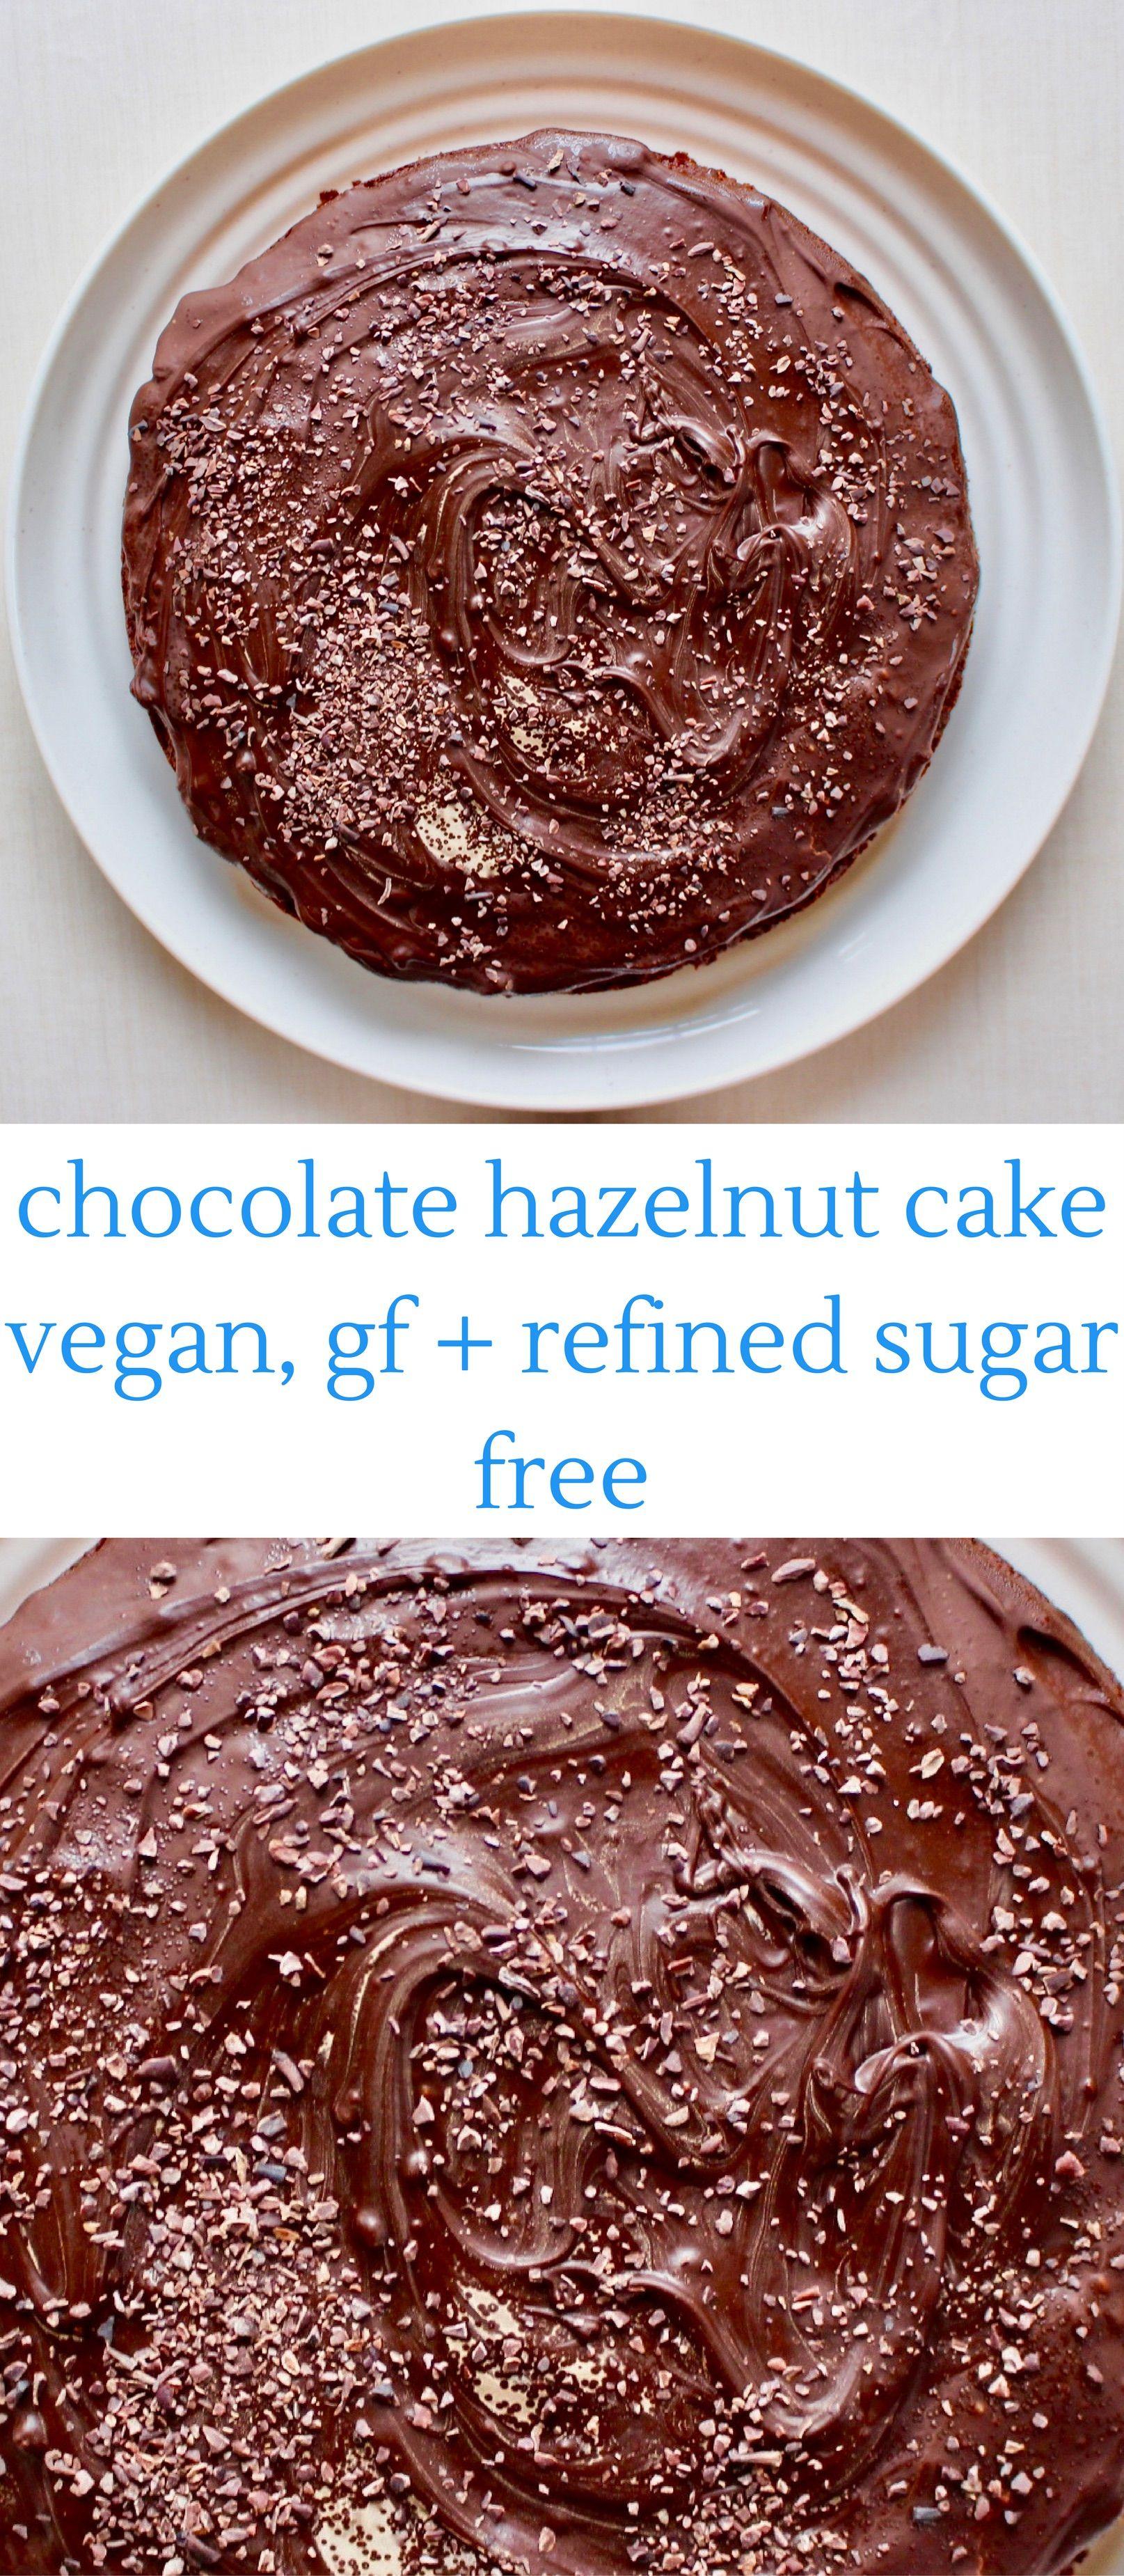 Chocolate Hazelnut Cake (vegan, GF and refined sugar free)